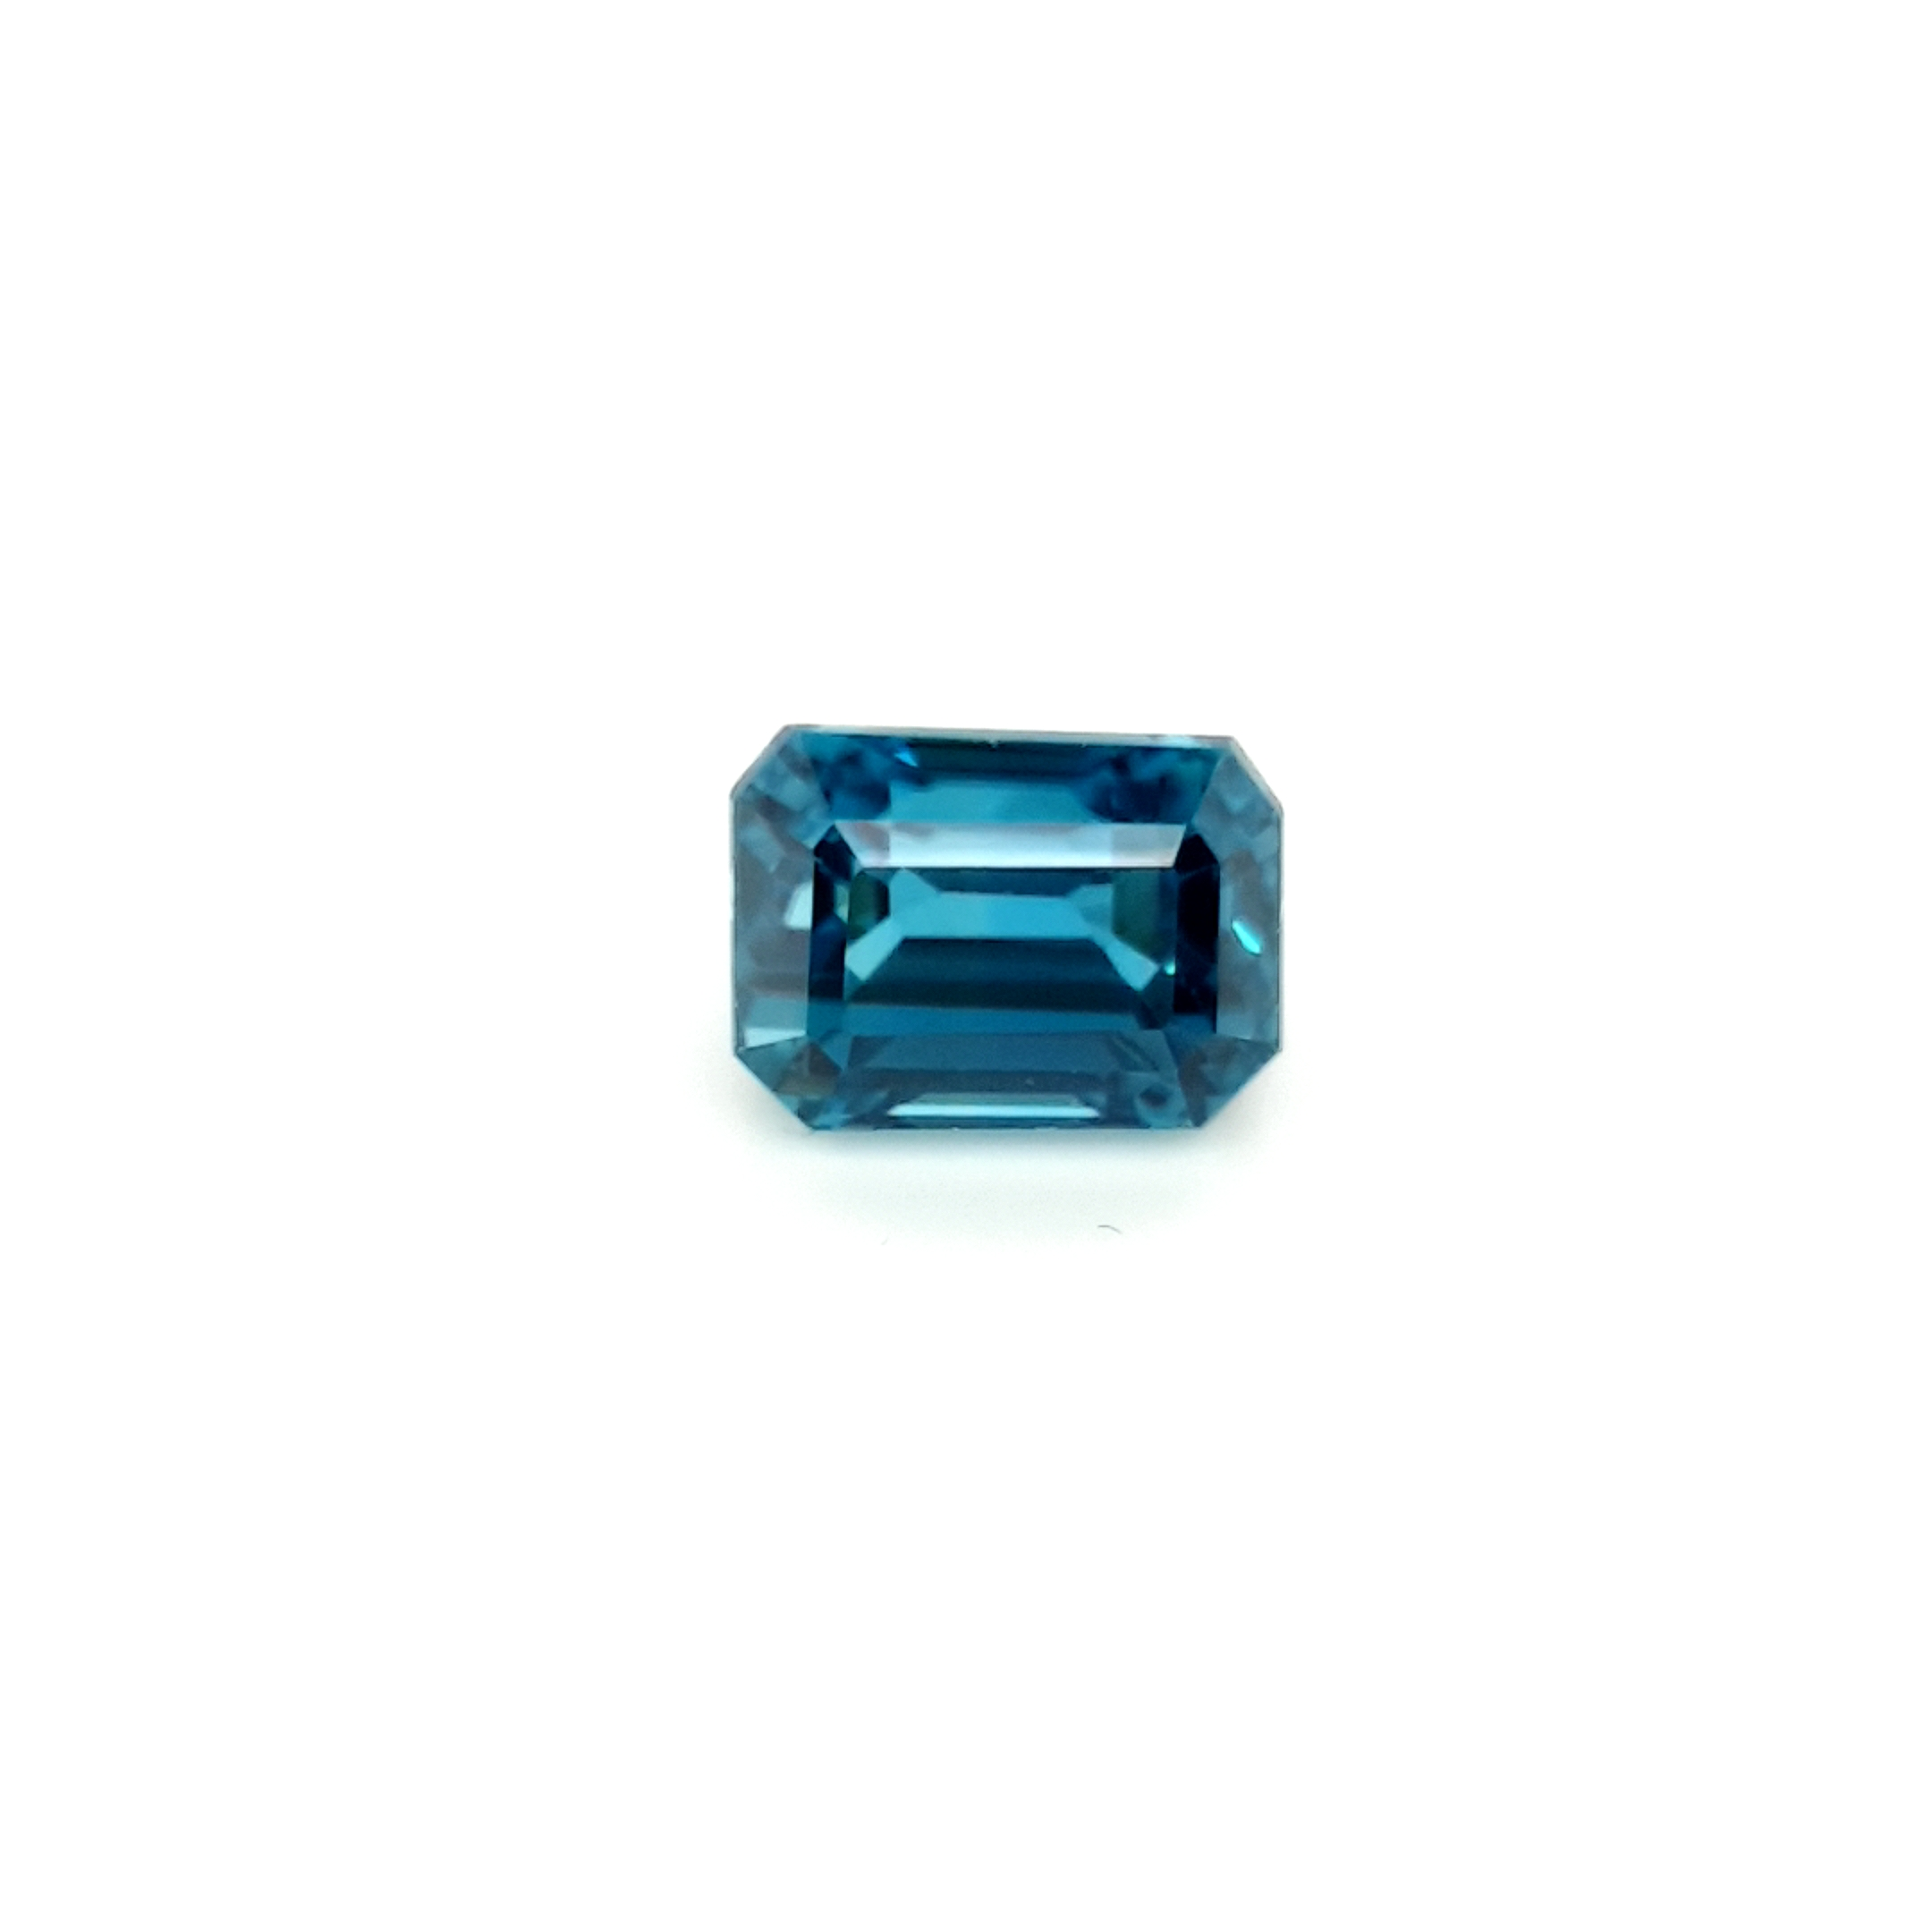 7,75ct. Octagone Starlight Blue Zircon ZCF18D5 ClaudiaHamann__2021-04-15-11-41-25